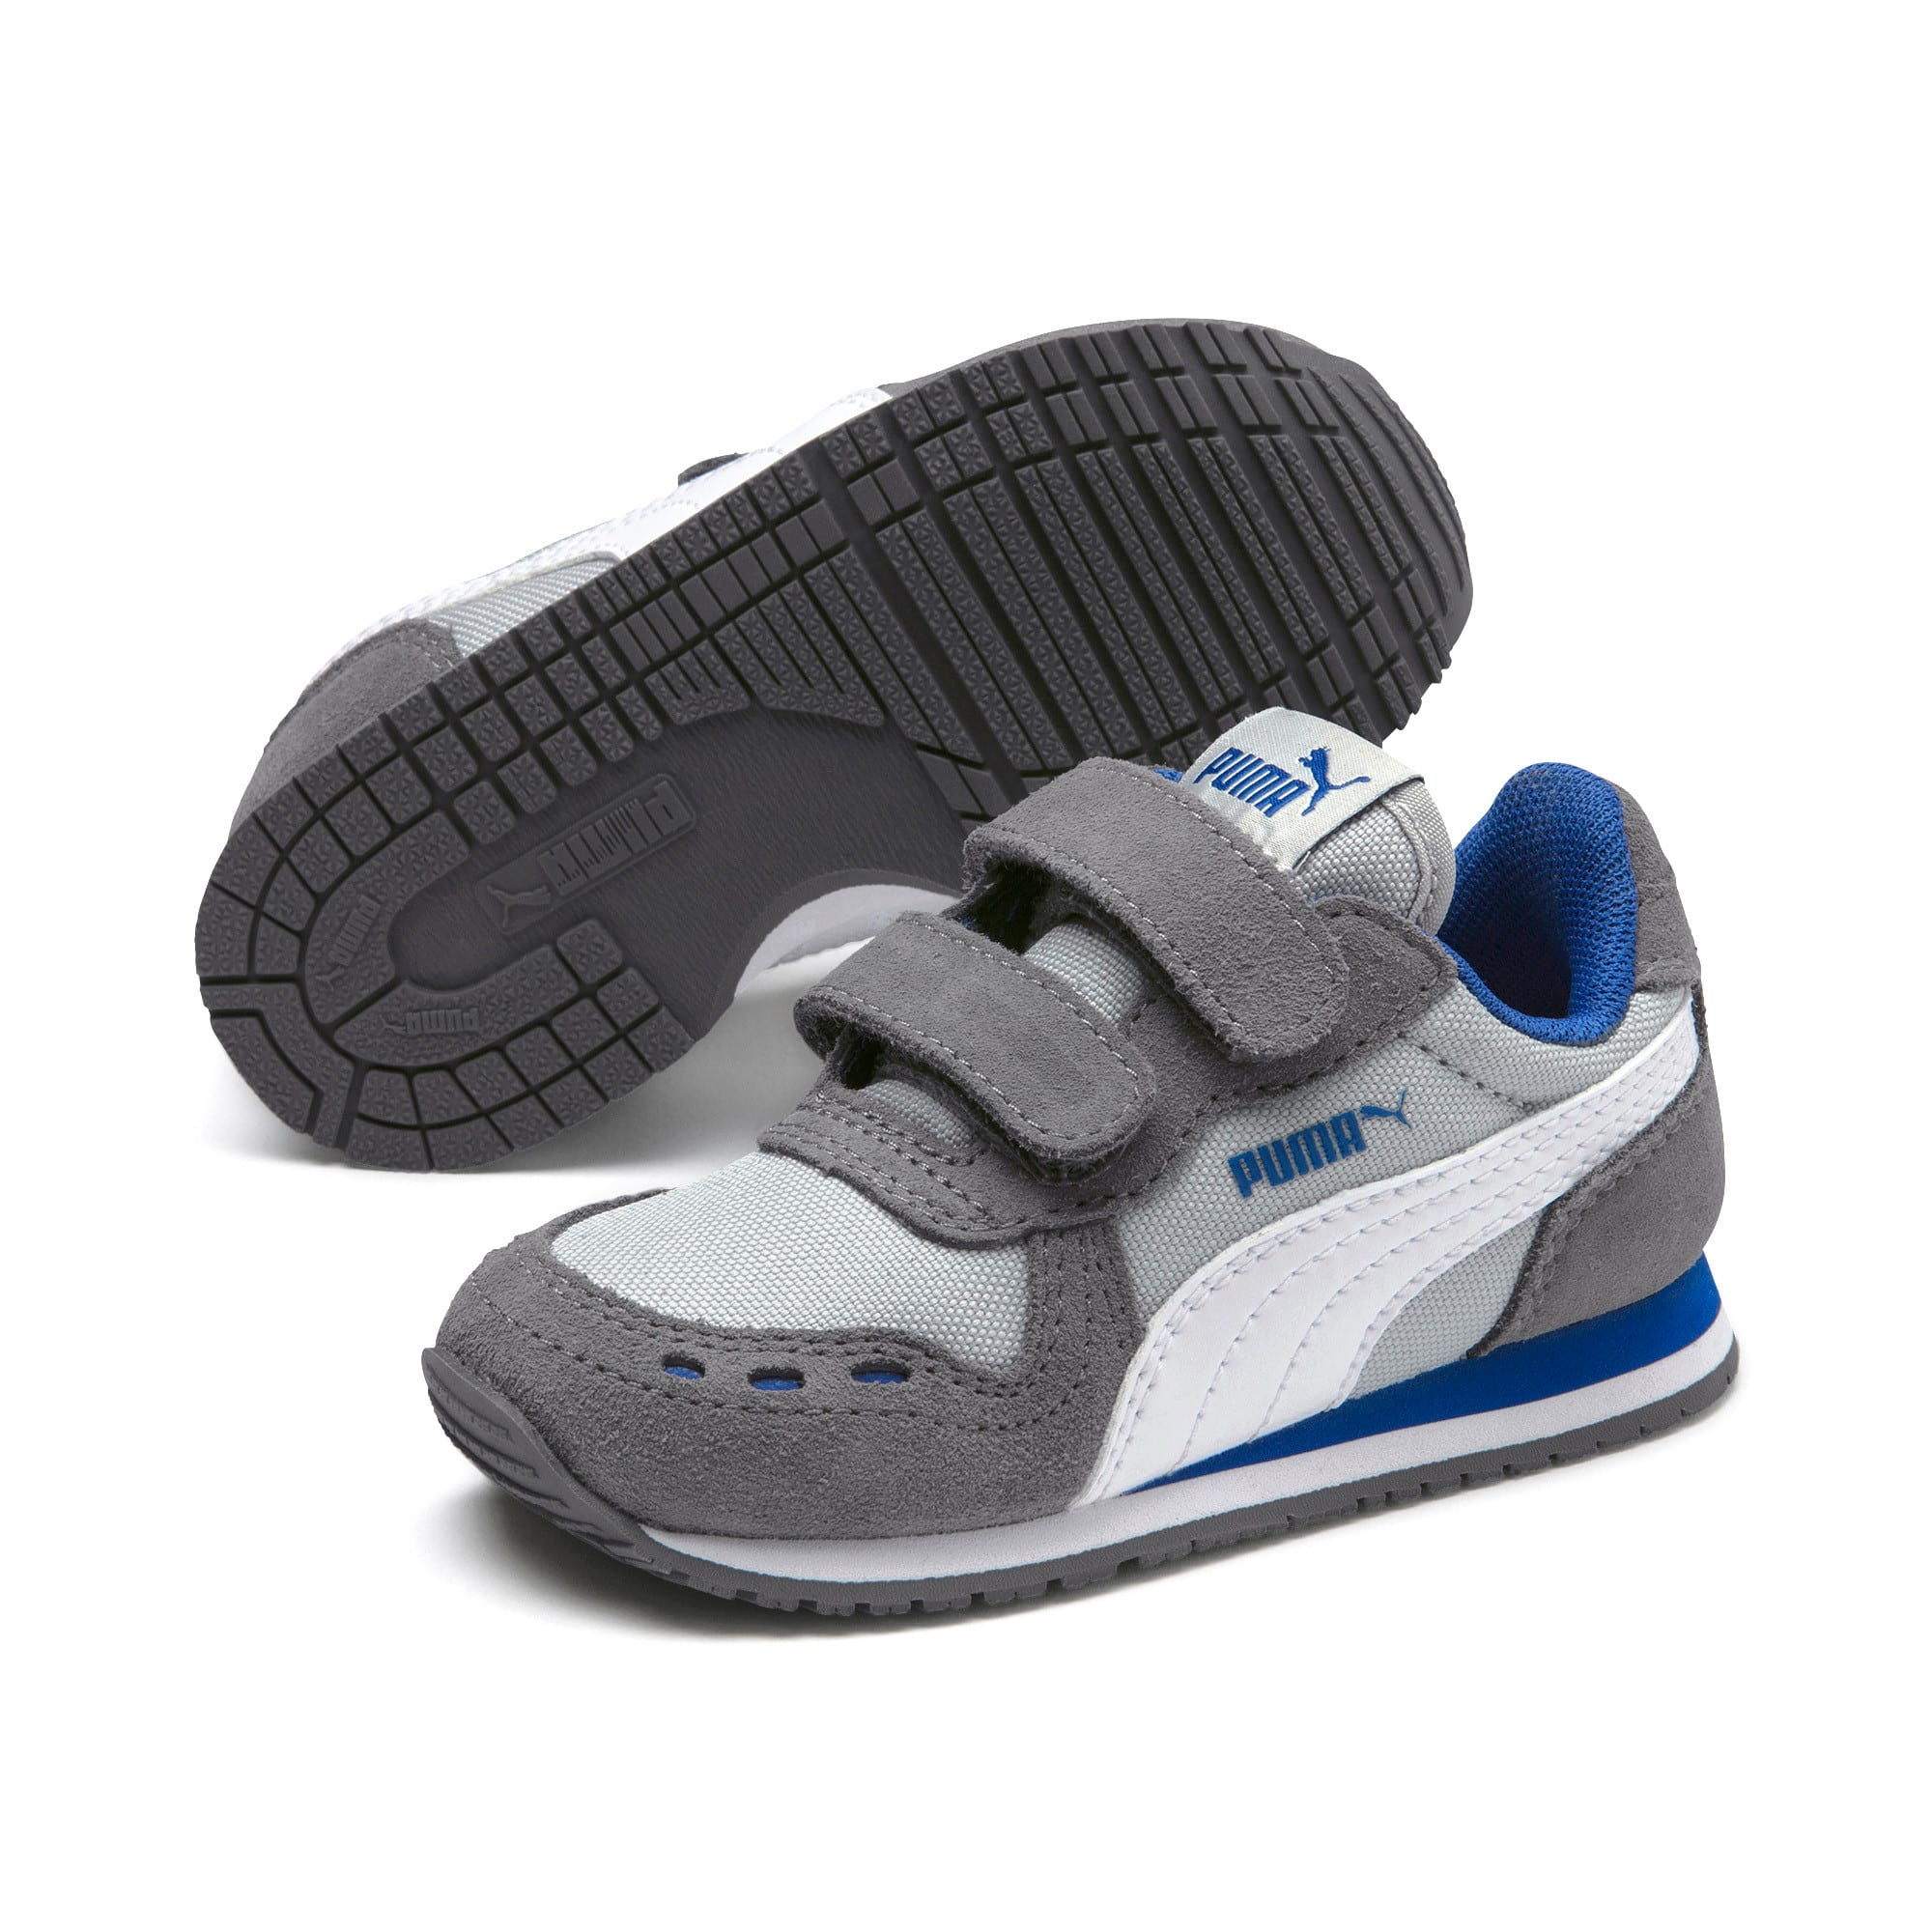 Thumbnail 2 of Cabana Racer Toddler Shoes, High Rise-CASTLEROCK, medium